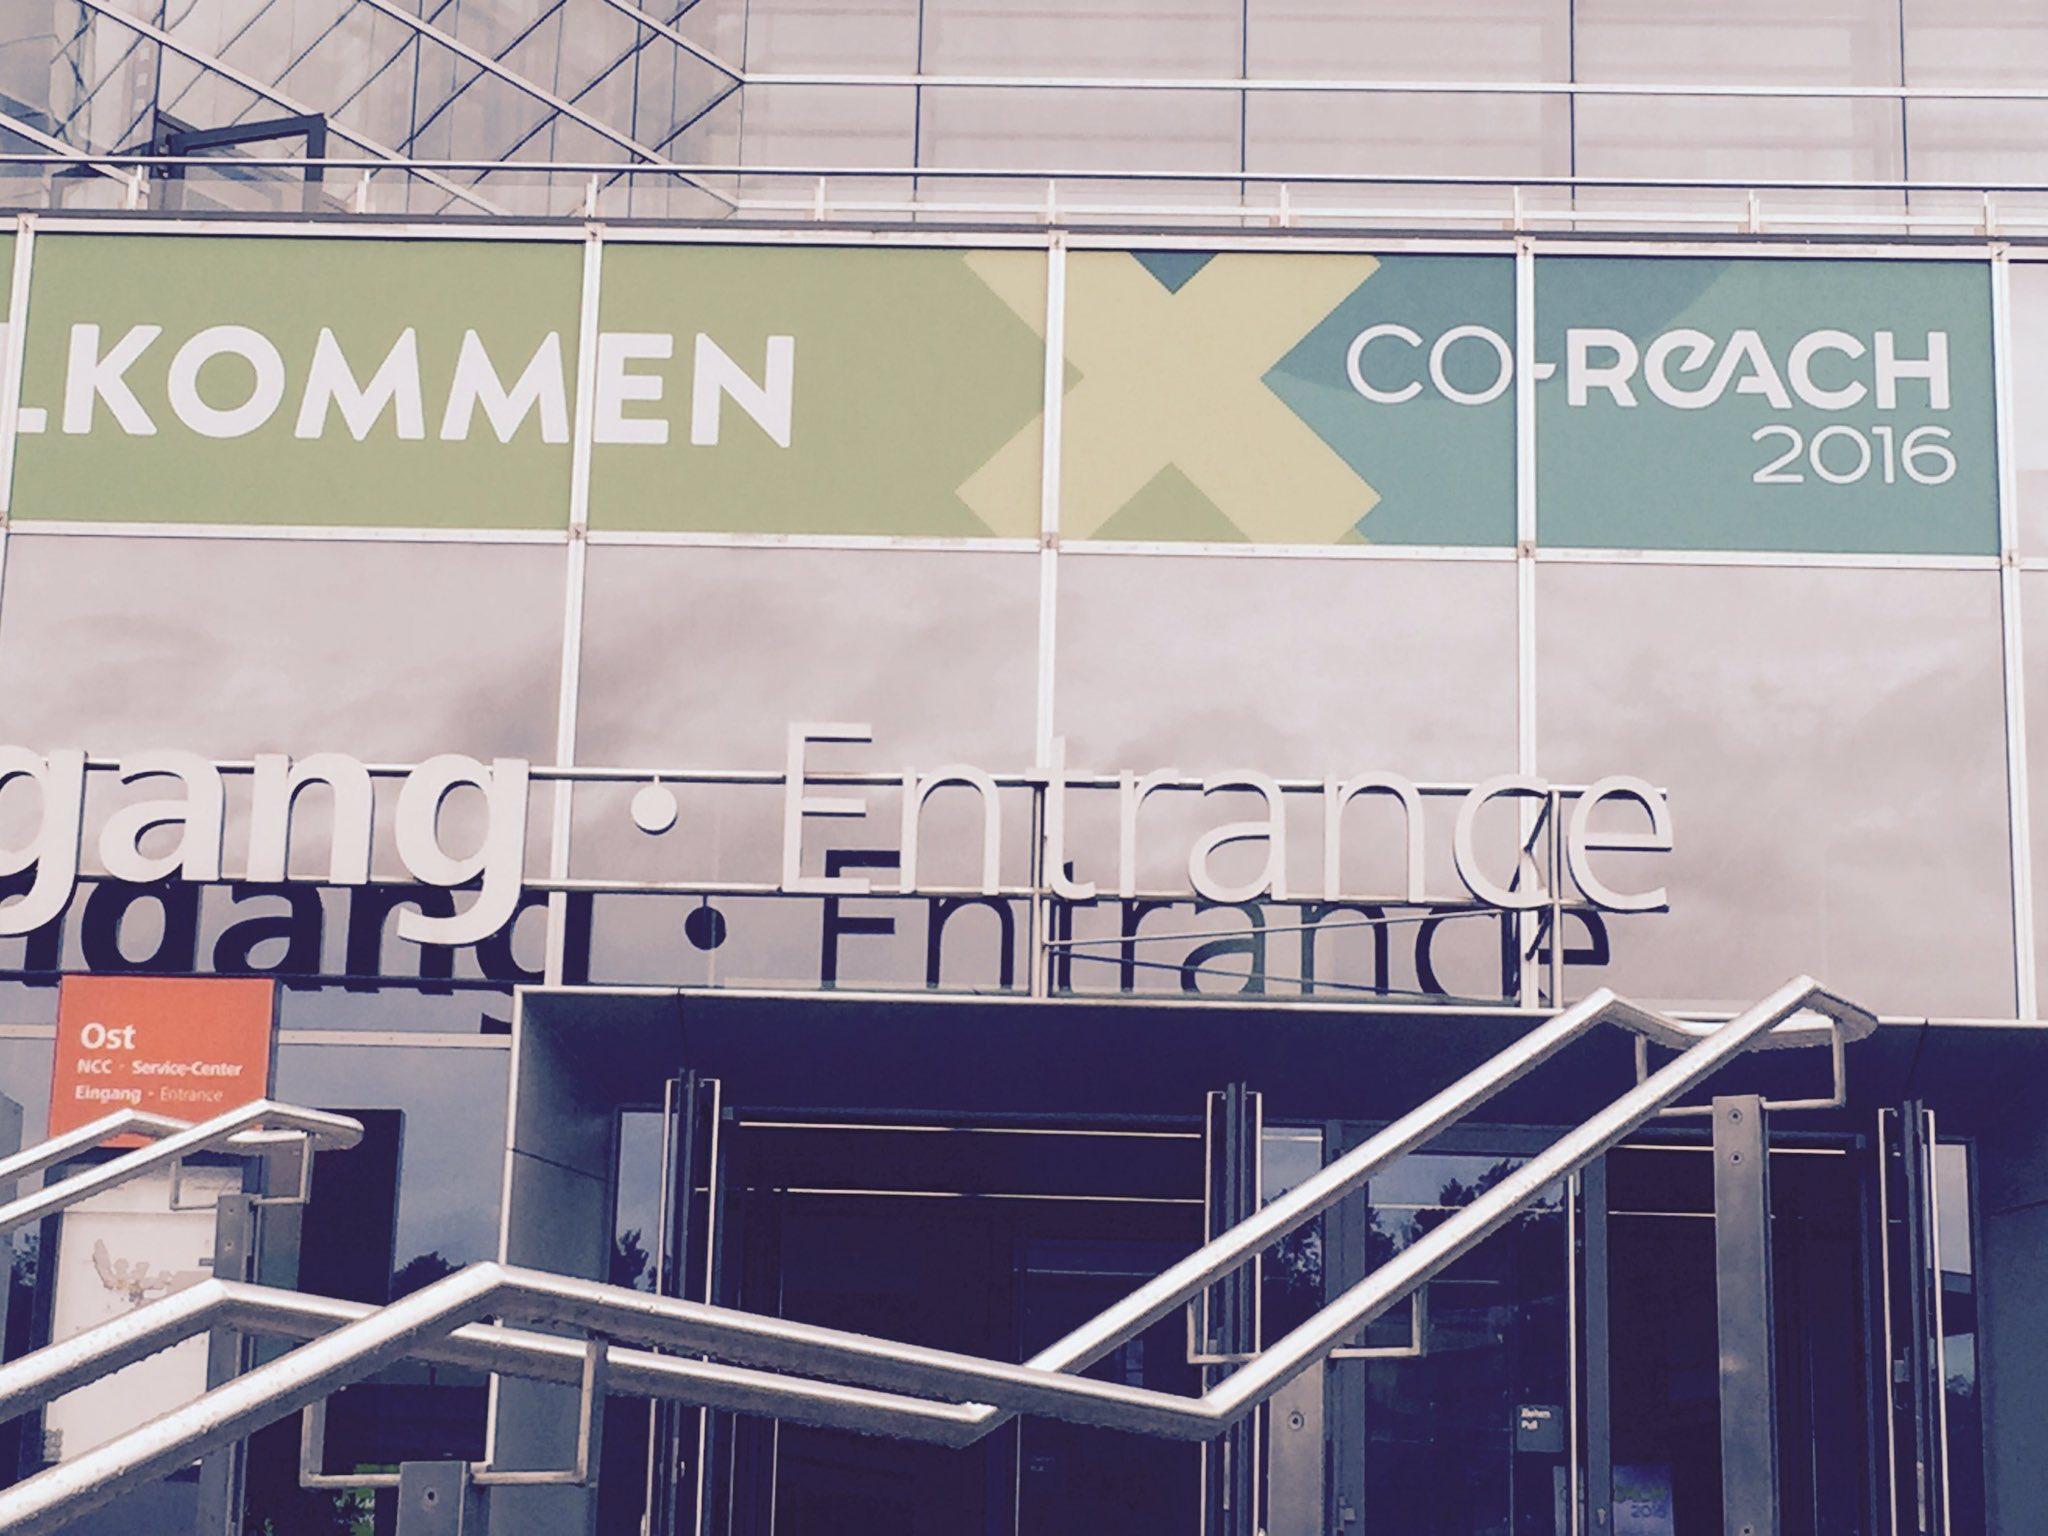 Mal sehen, was die #coreach bietet. @COREACHmesse https://t.co/FIAgvHfOK6